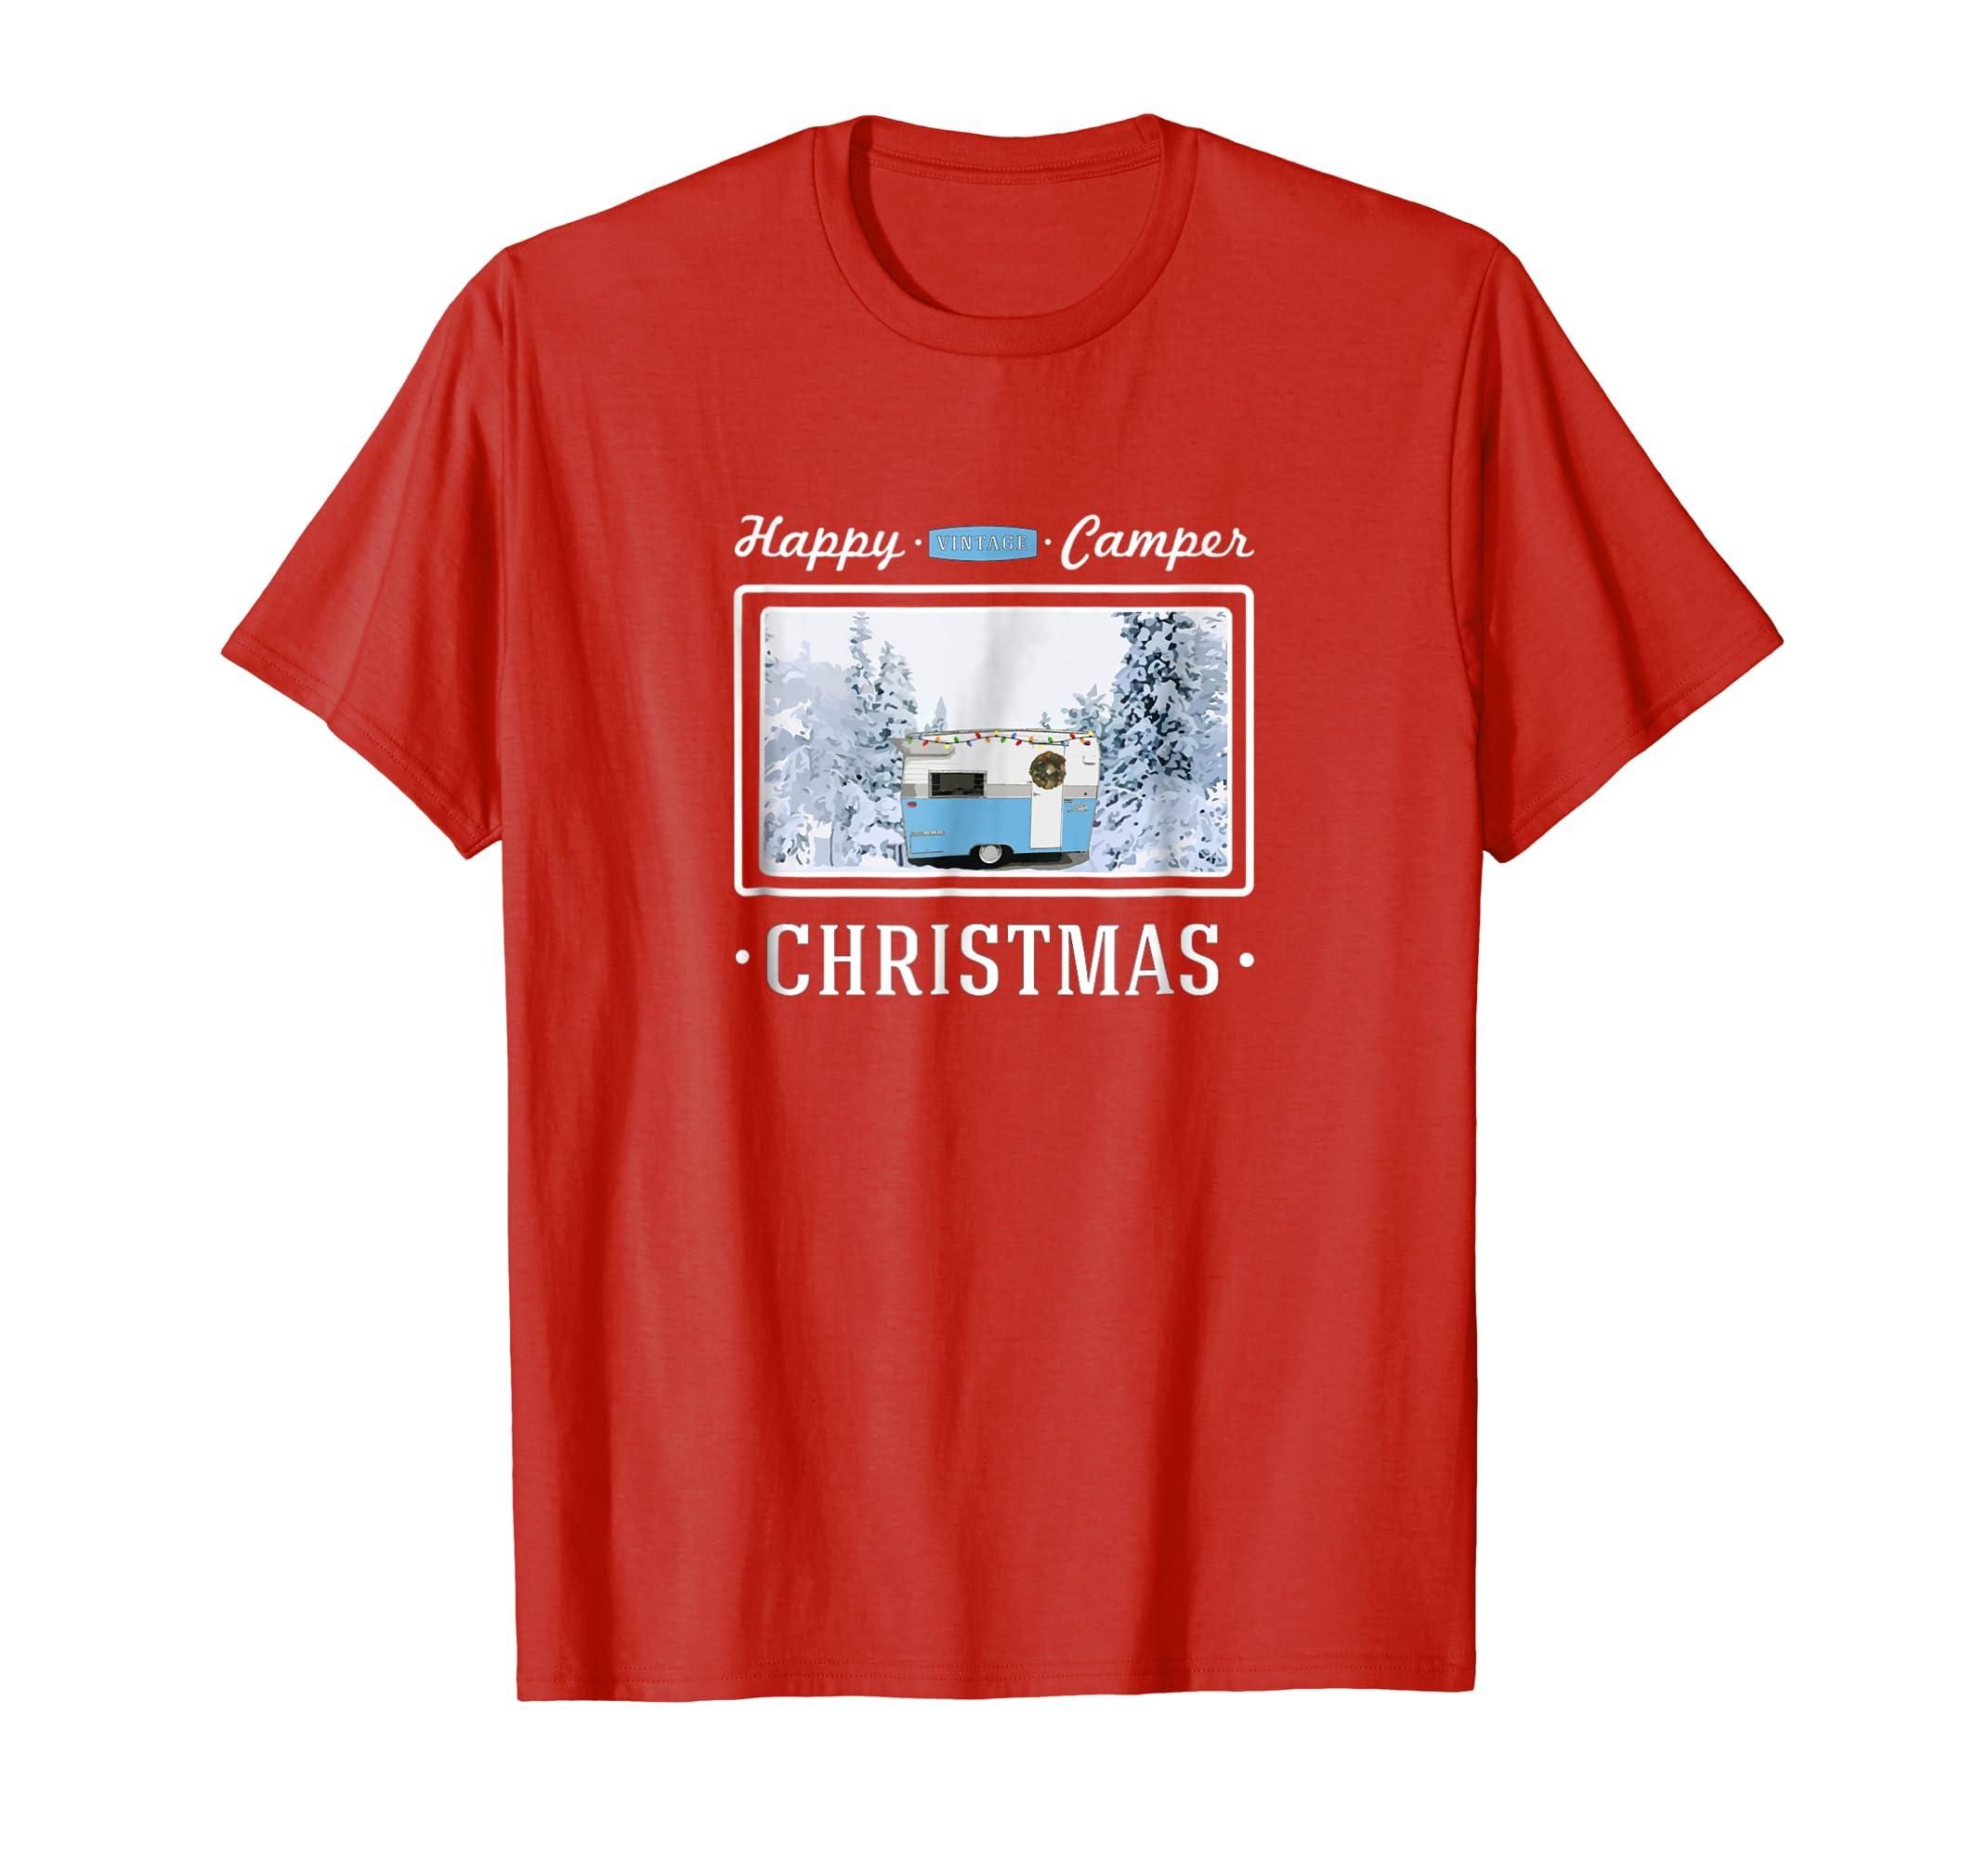 dfc6b753 Amazon.com: Happy Camper Christmas Vintage Shasta Trailer Graphic ...